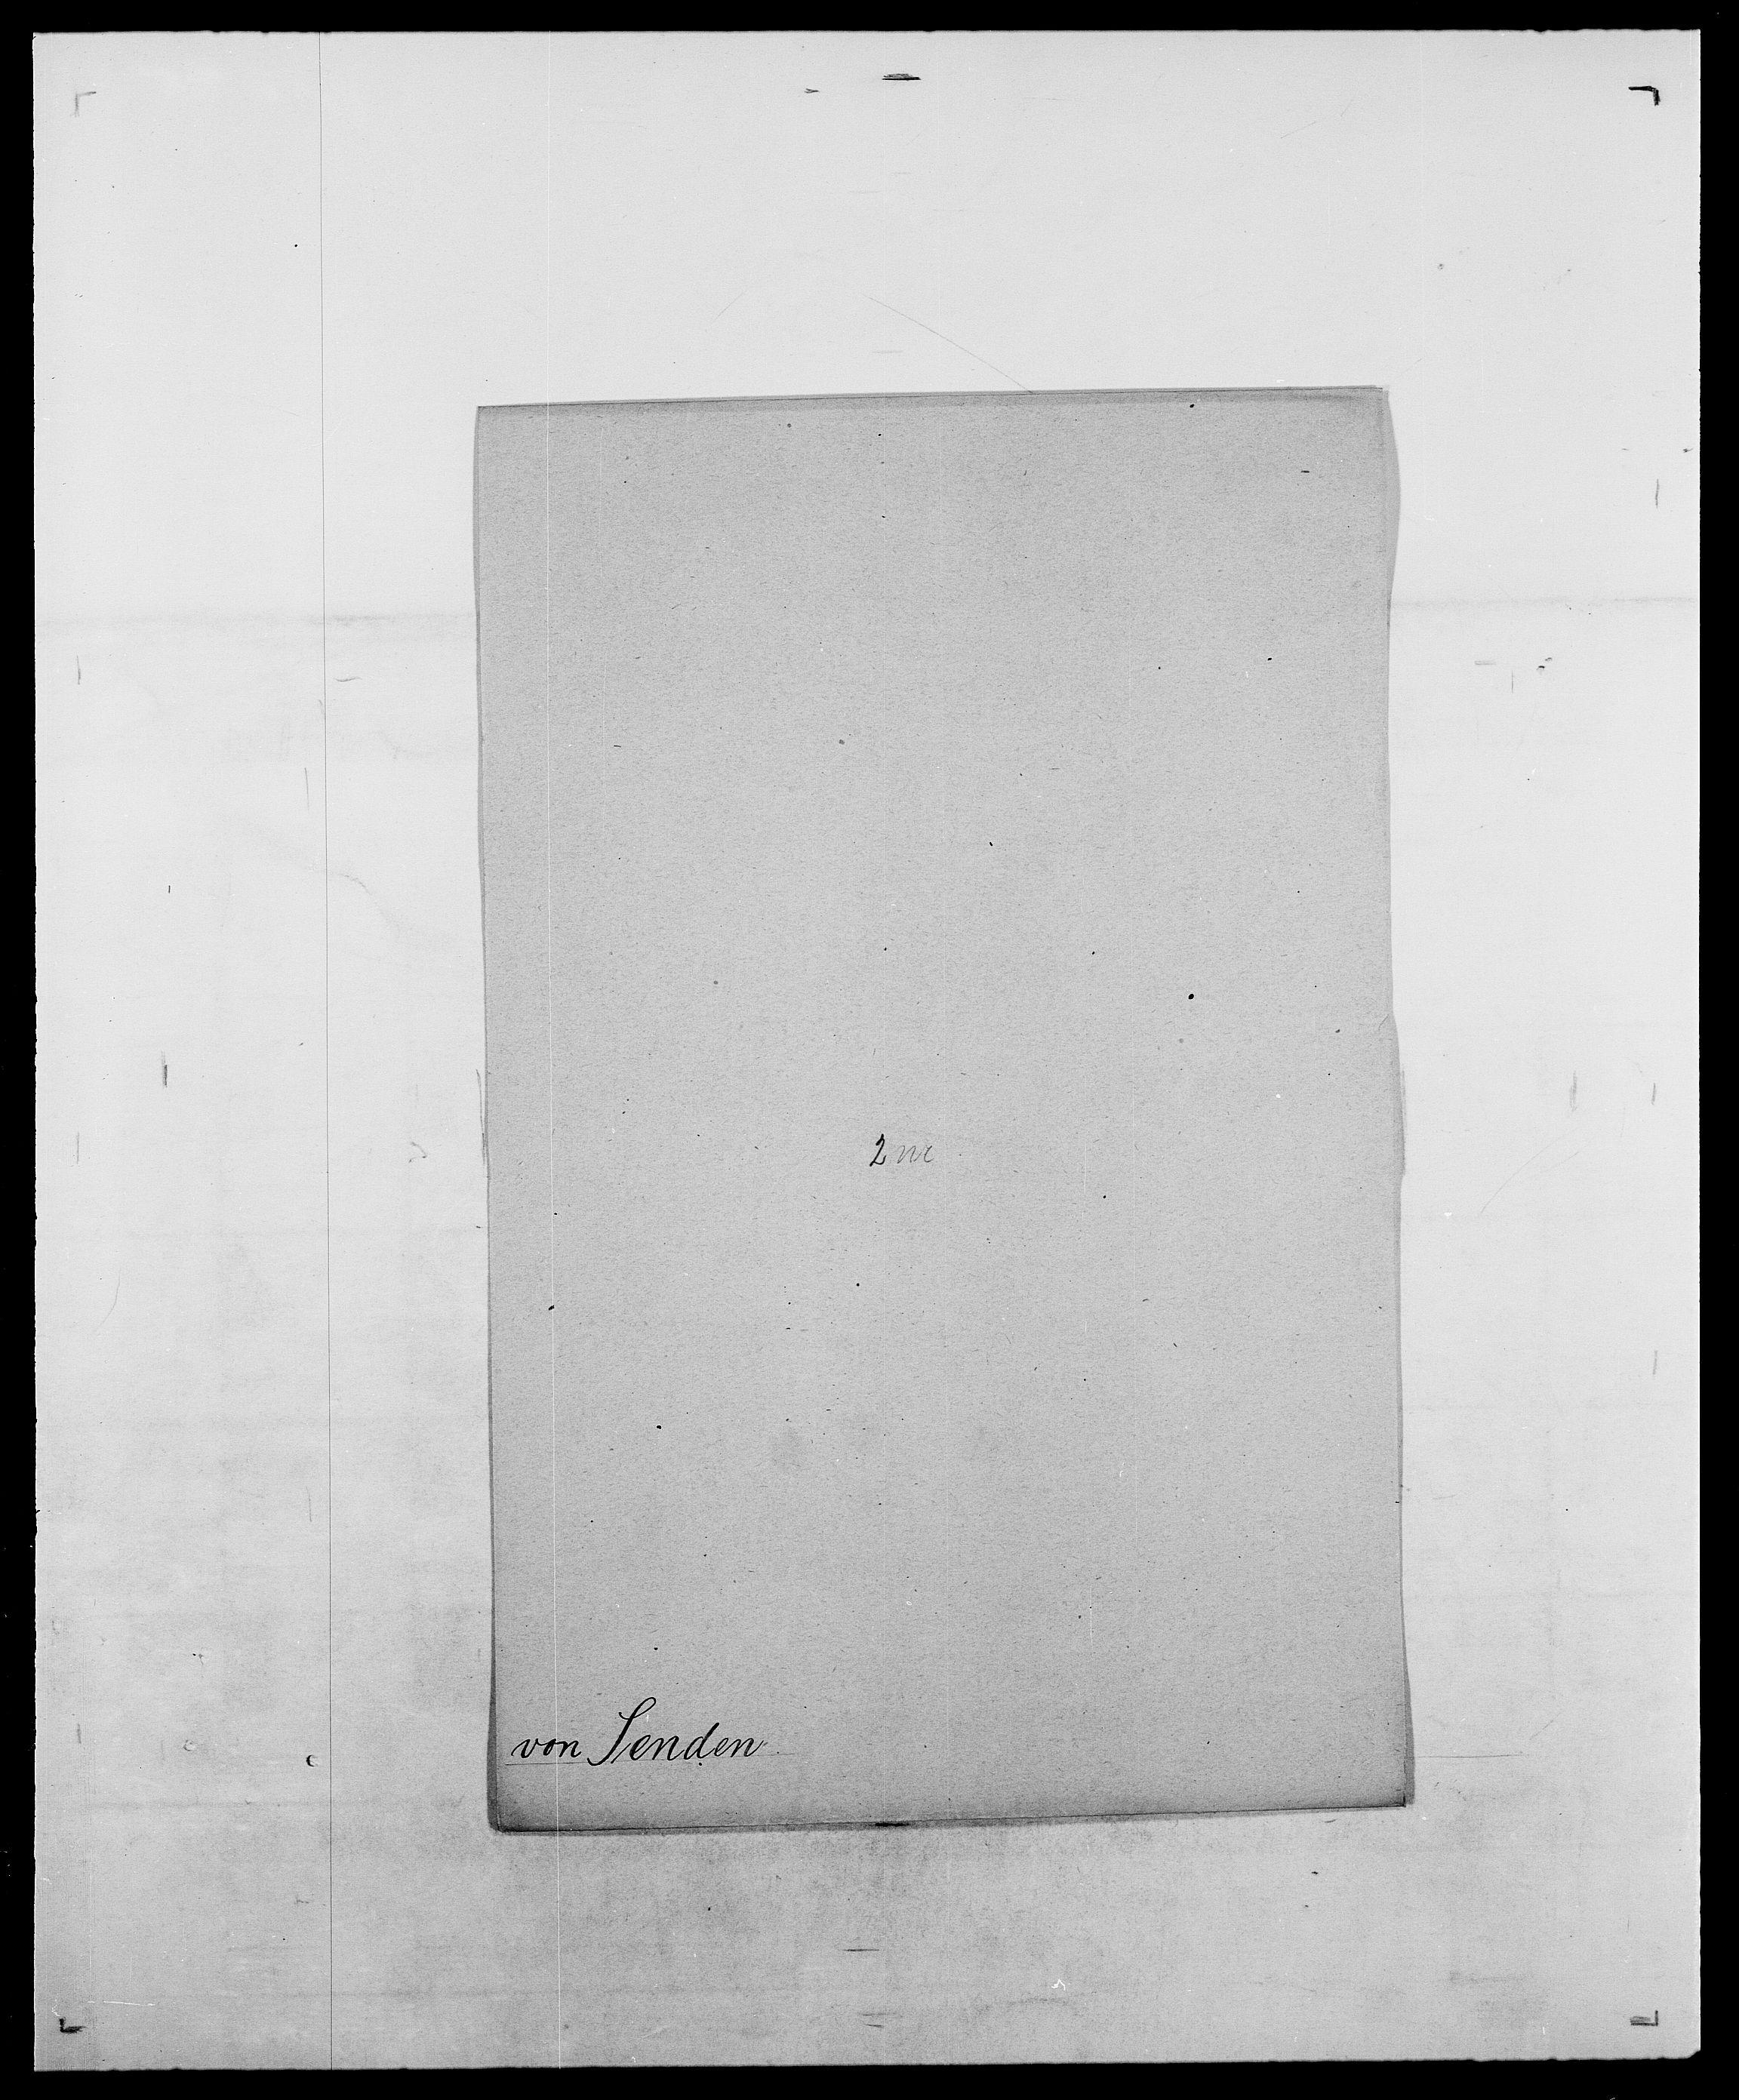 SAO, Delgobe, Charles Antoine - samling, D/Da/L0035: Schnabel - sjetman, s. 707